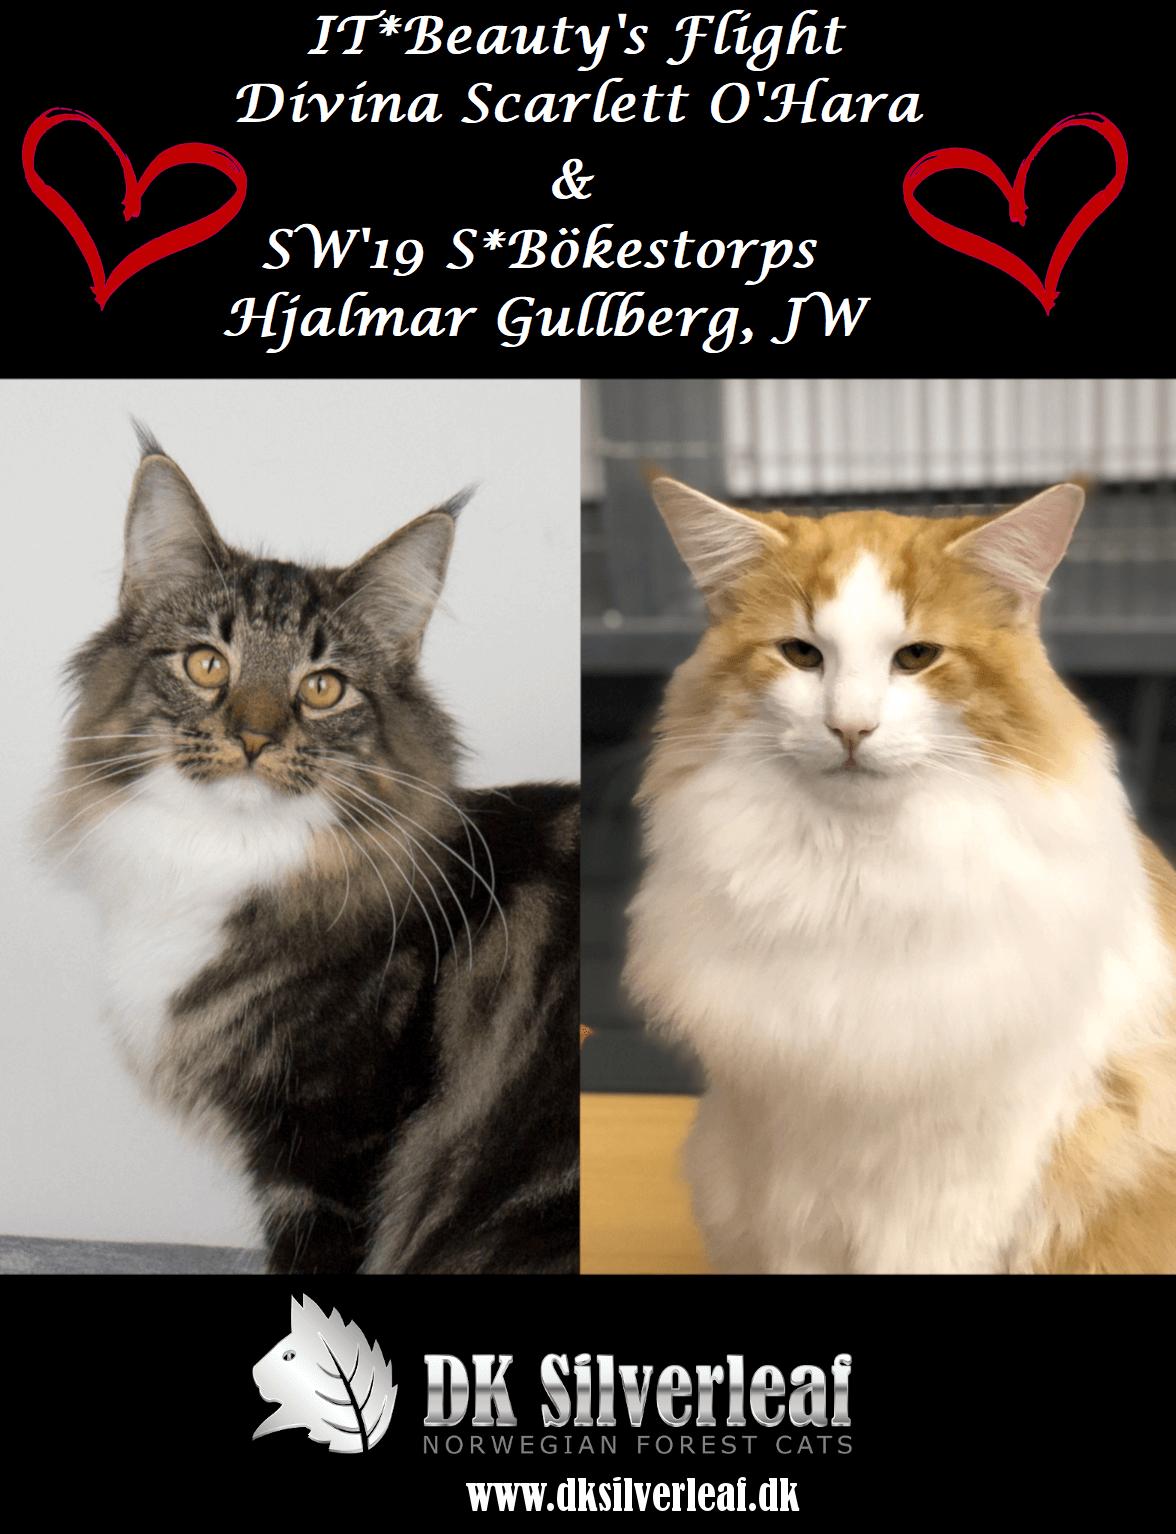 DK Silverleaf's Pasta kuld • DK Silverleaf • Norsk Skovkatte • Norwegian Forest cats